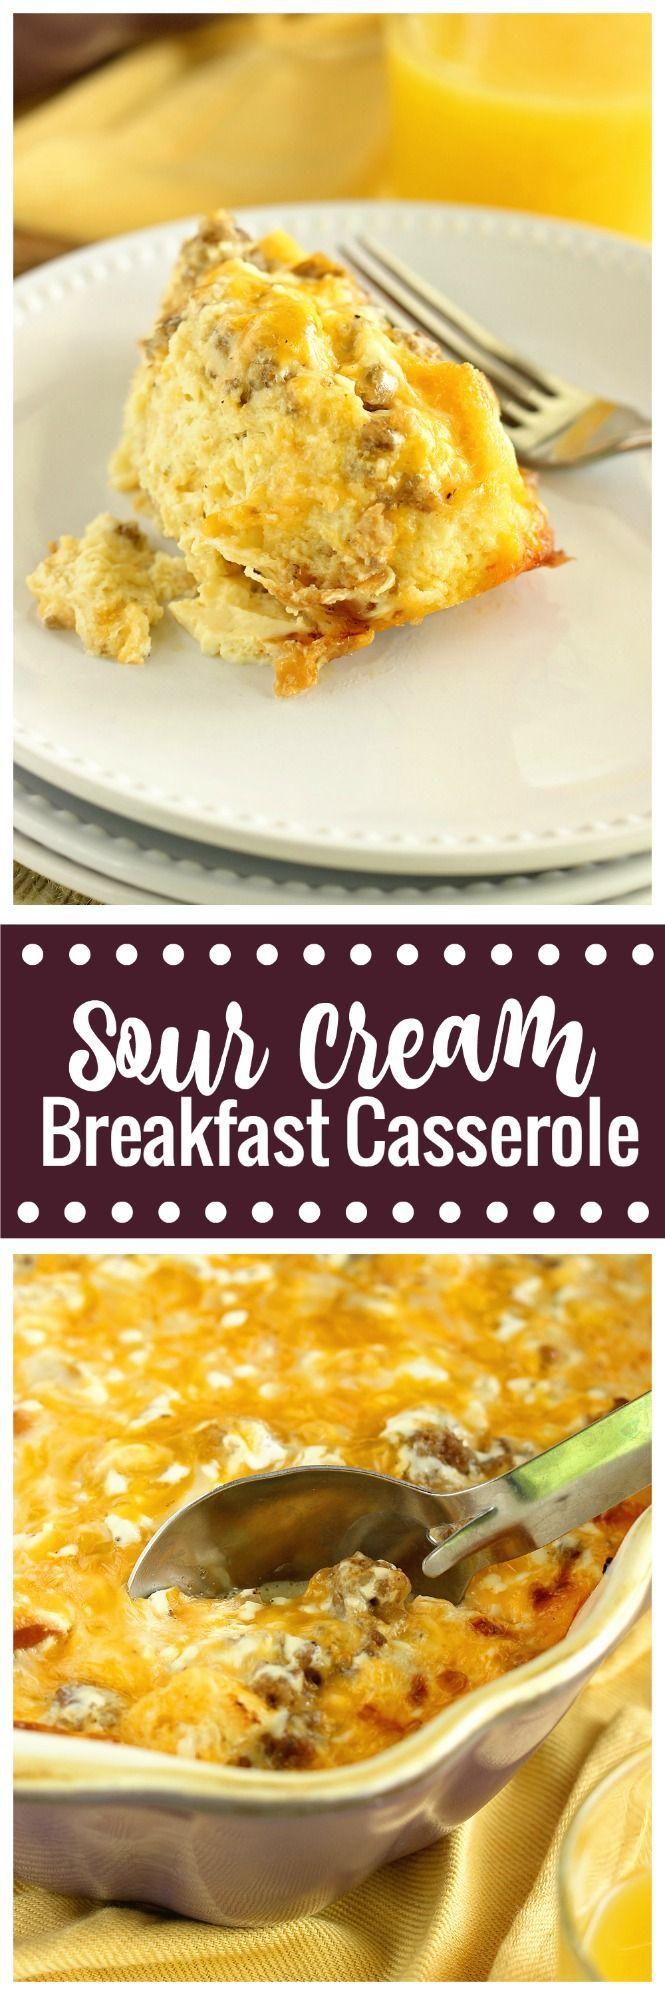 Sour Cream Breakfast Casserole Diary Of A Recipe Collector Breakfast Recipes Casserole Breakfast Casserole Sausage Recipes